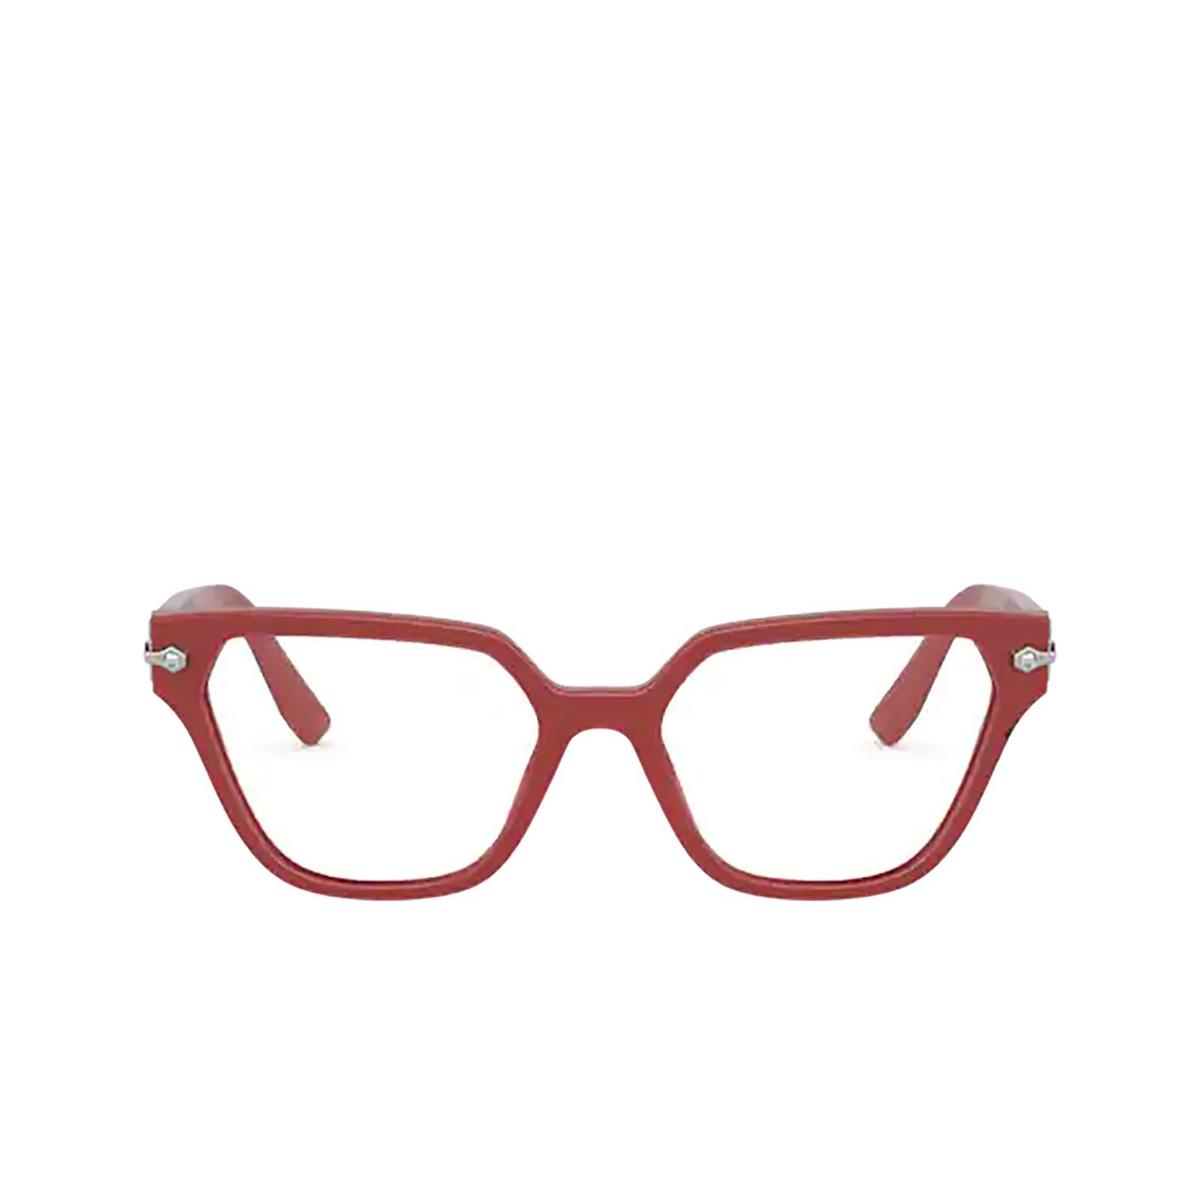 Miu Miu® Irregular Eyeglasses: Special Project MU 02TV color Dark Pink / Crystal 05F1O1 - front view.